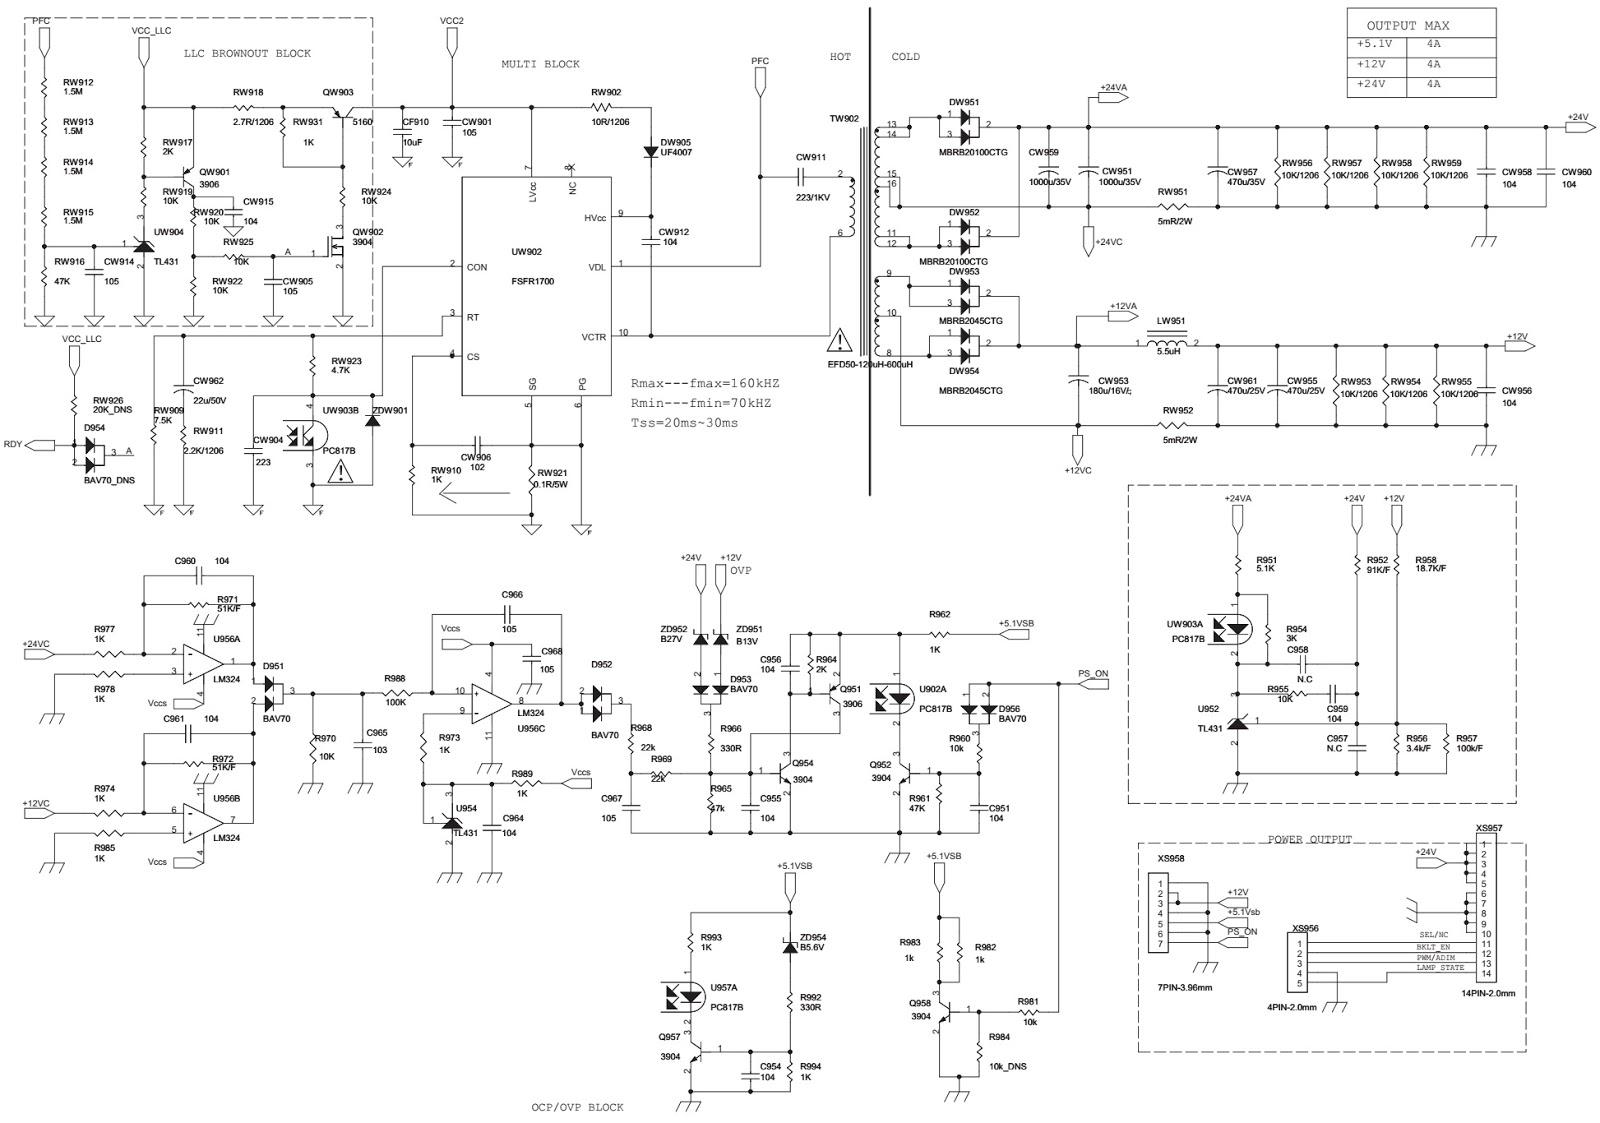 Fein Smps Pin Diagramm Ideen - Der Schaltplan - triangre.info